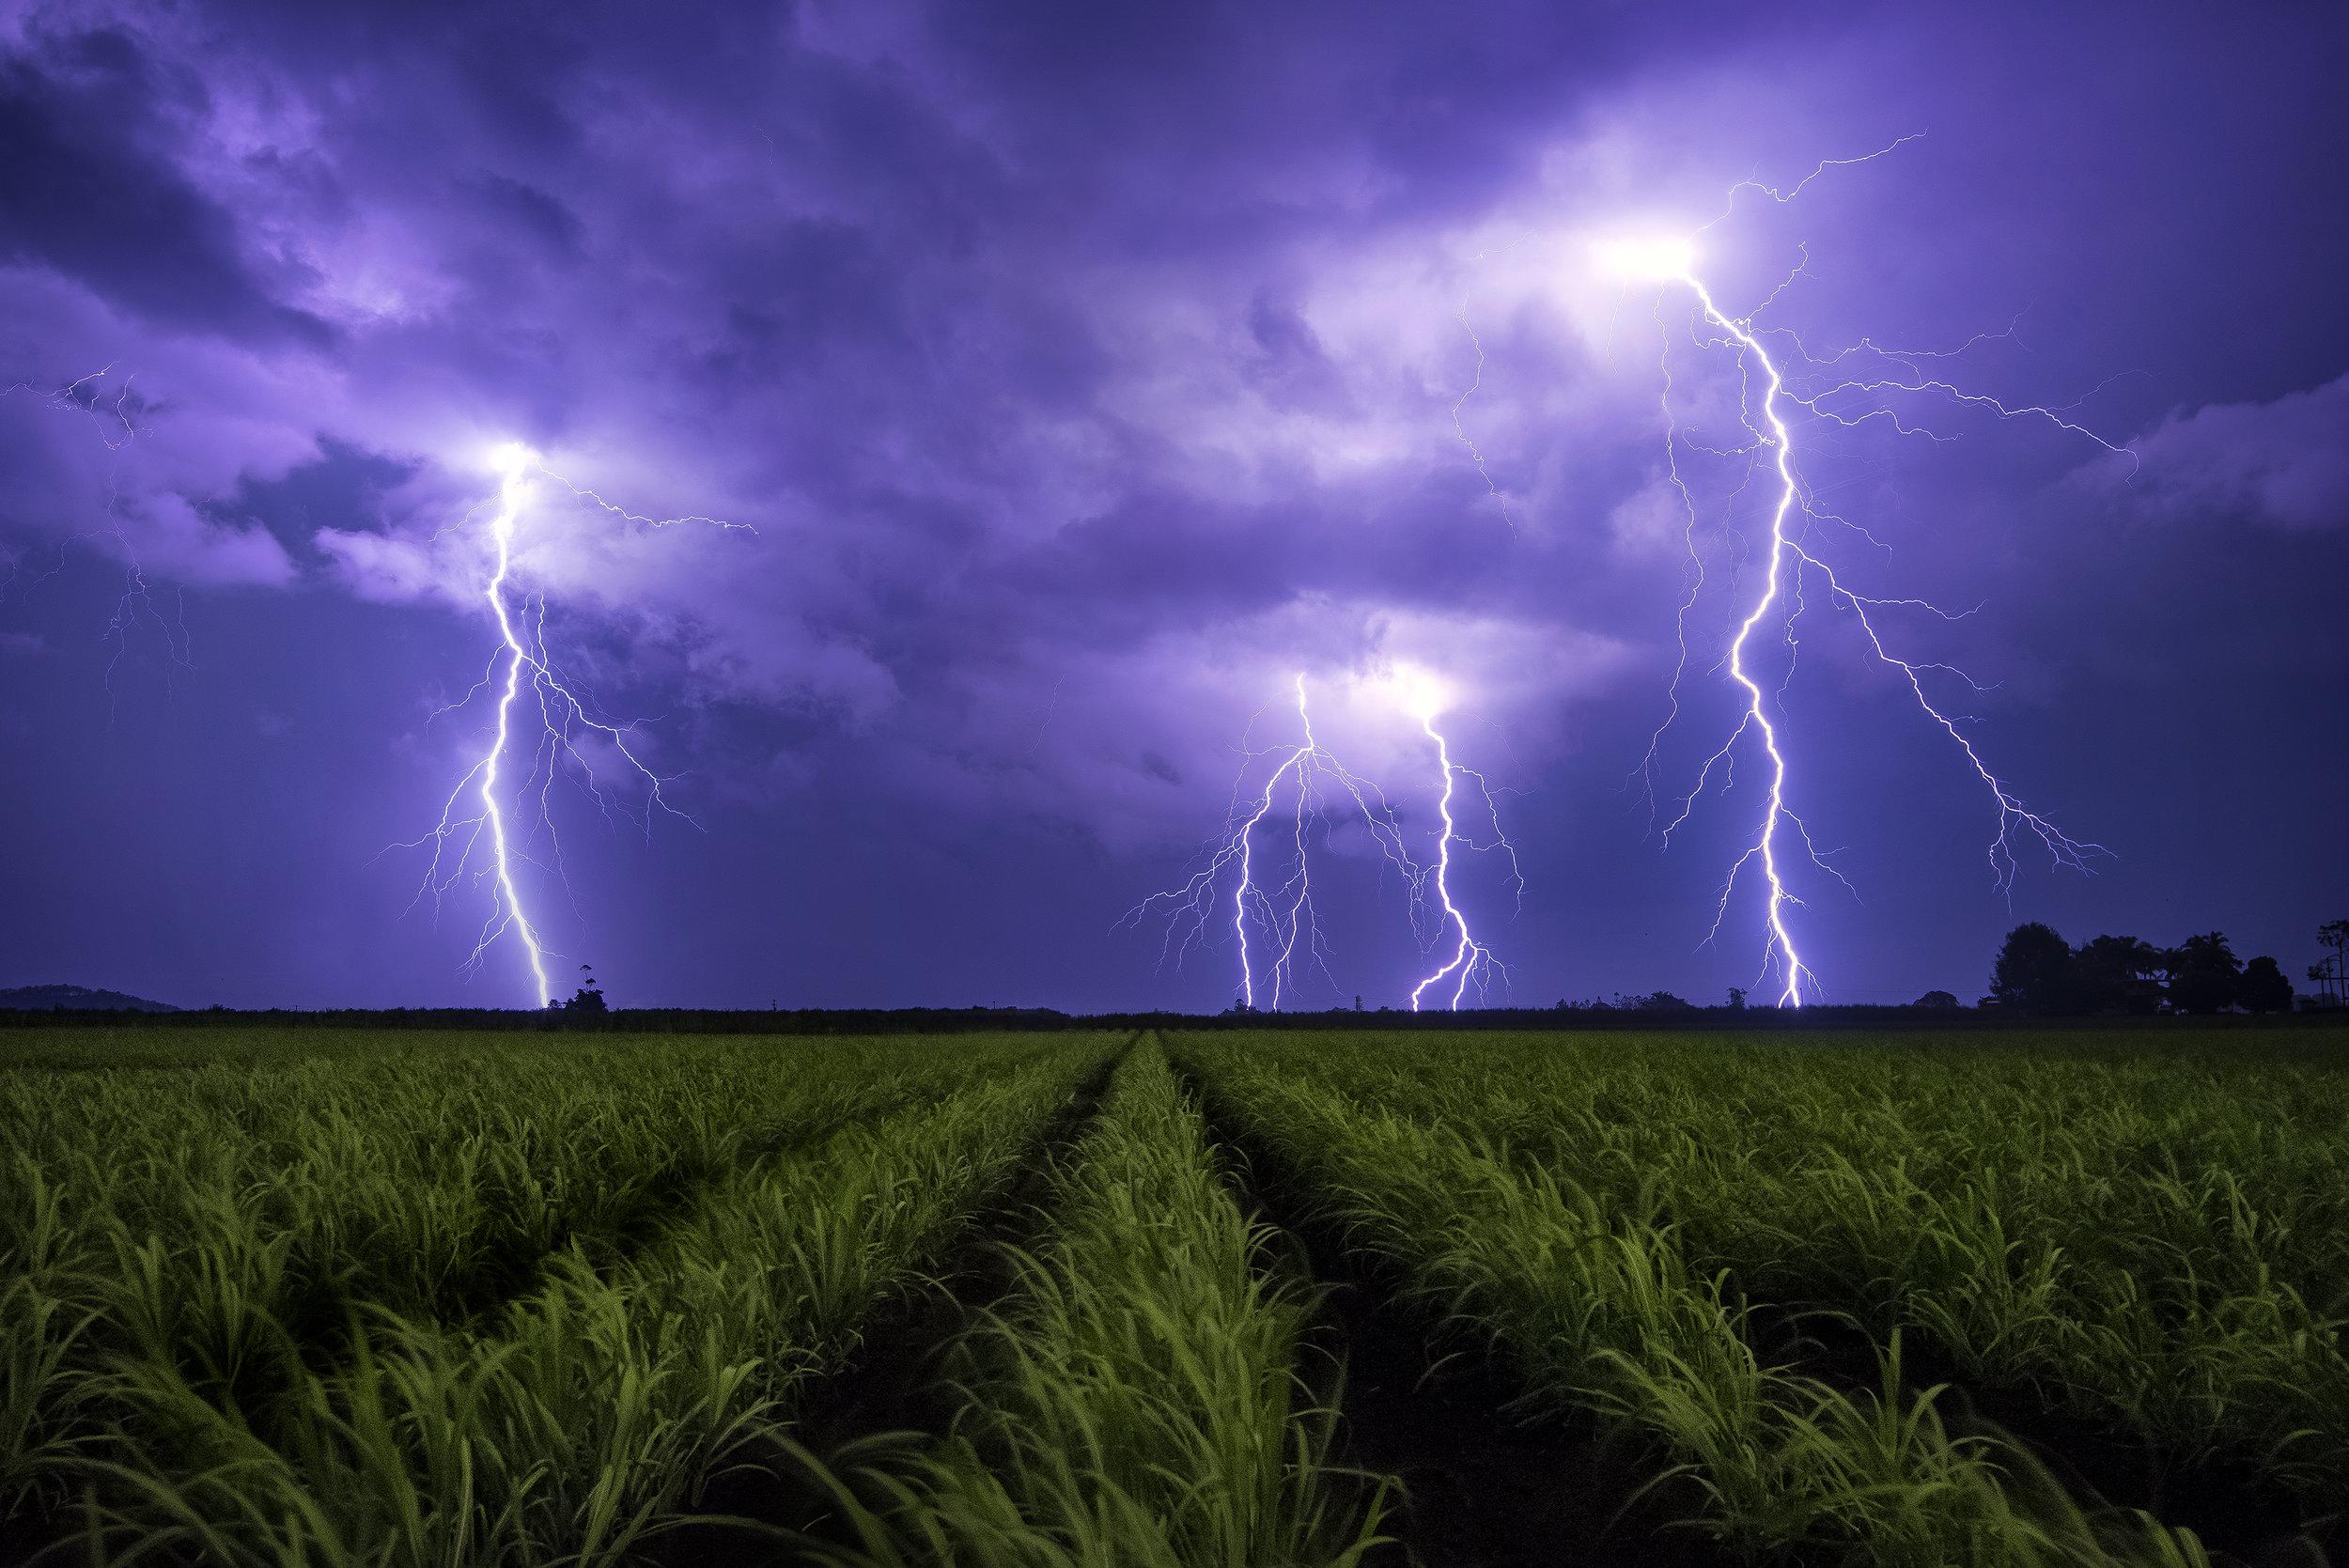 Murwillumbah Storm, NSW. Australia